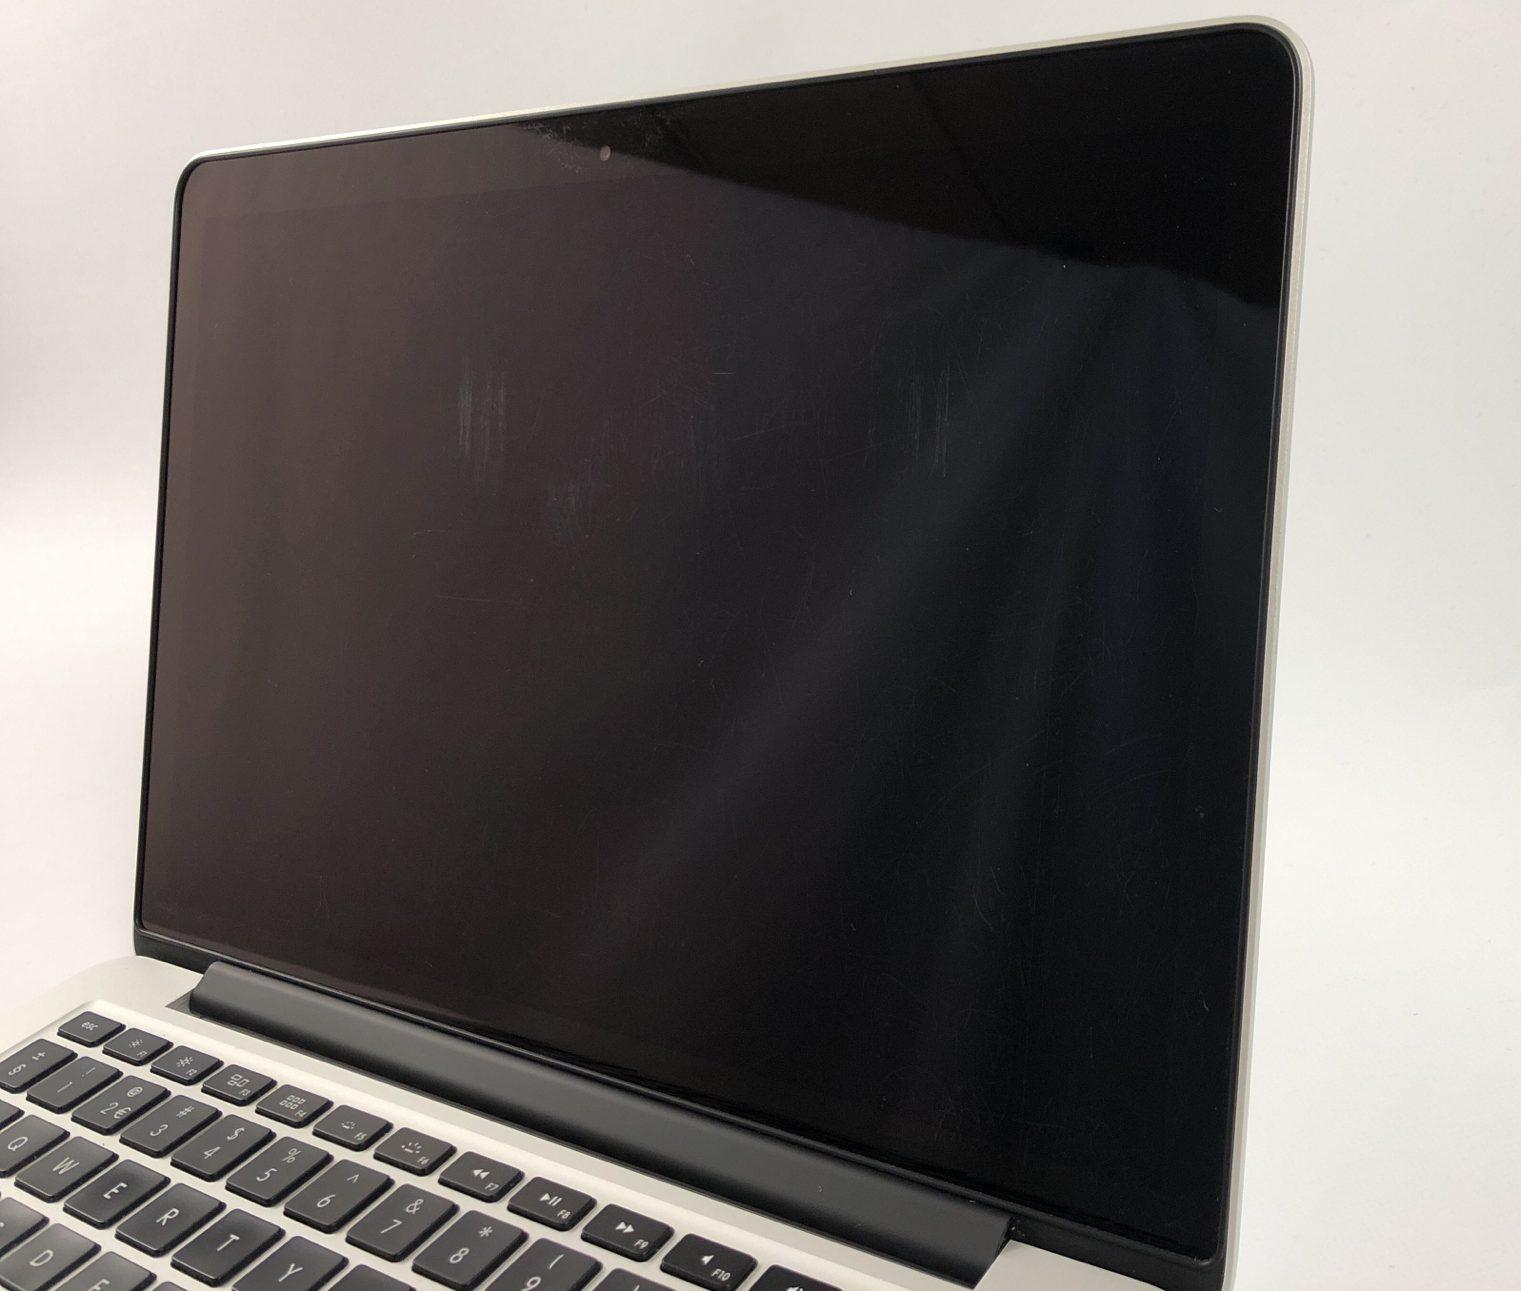 "MacBook Pro Retina 13"" Early 2015 (Intel Core i5 2.9 GHz 16 GB RAM 512 GB SSD), Intel Core i5 2.9 GHz, 16 GB RAM, 512 GB SSD, image 3"